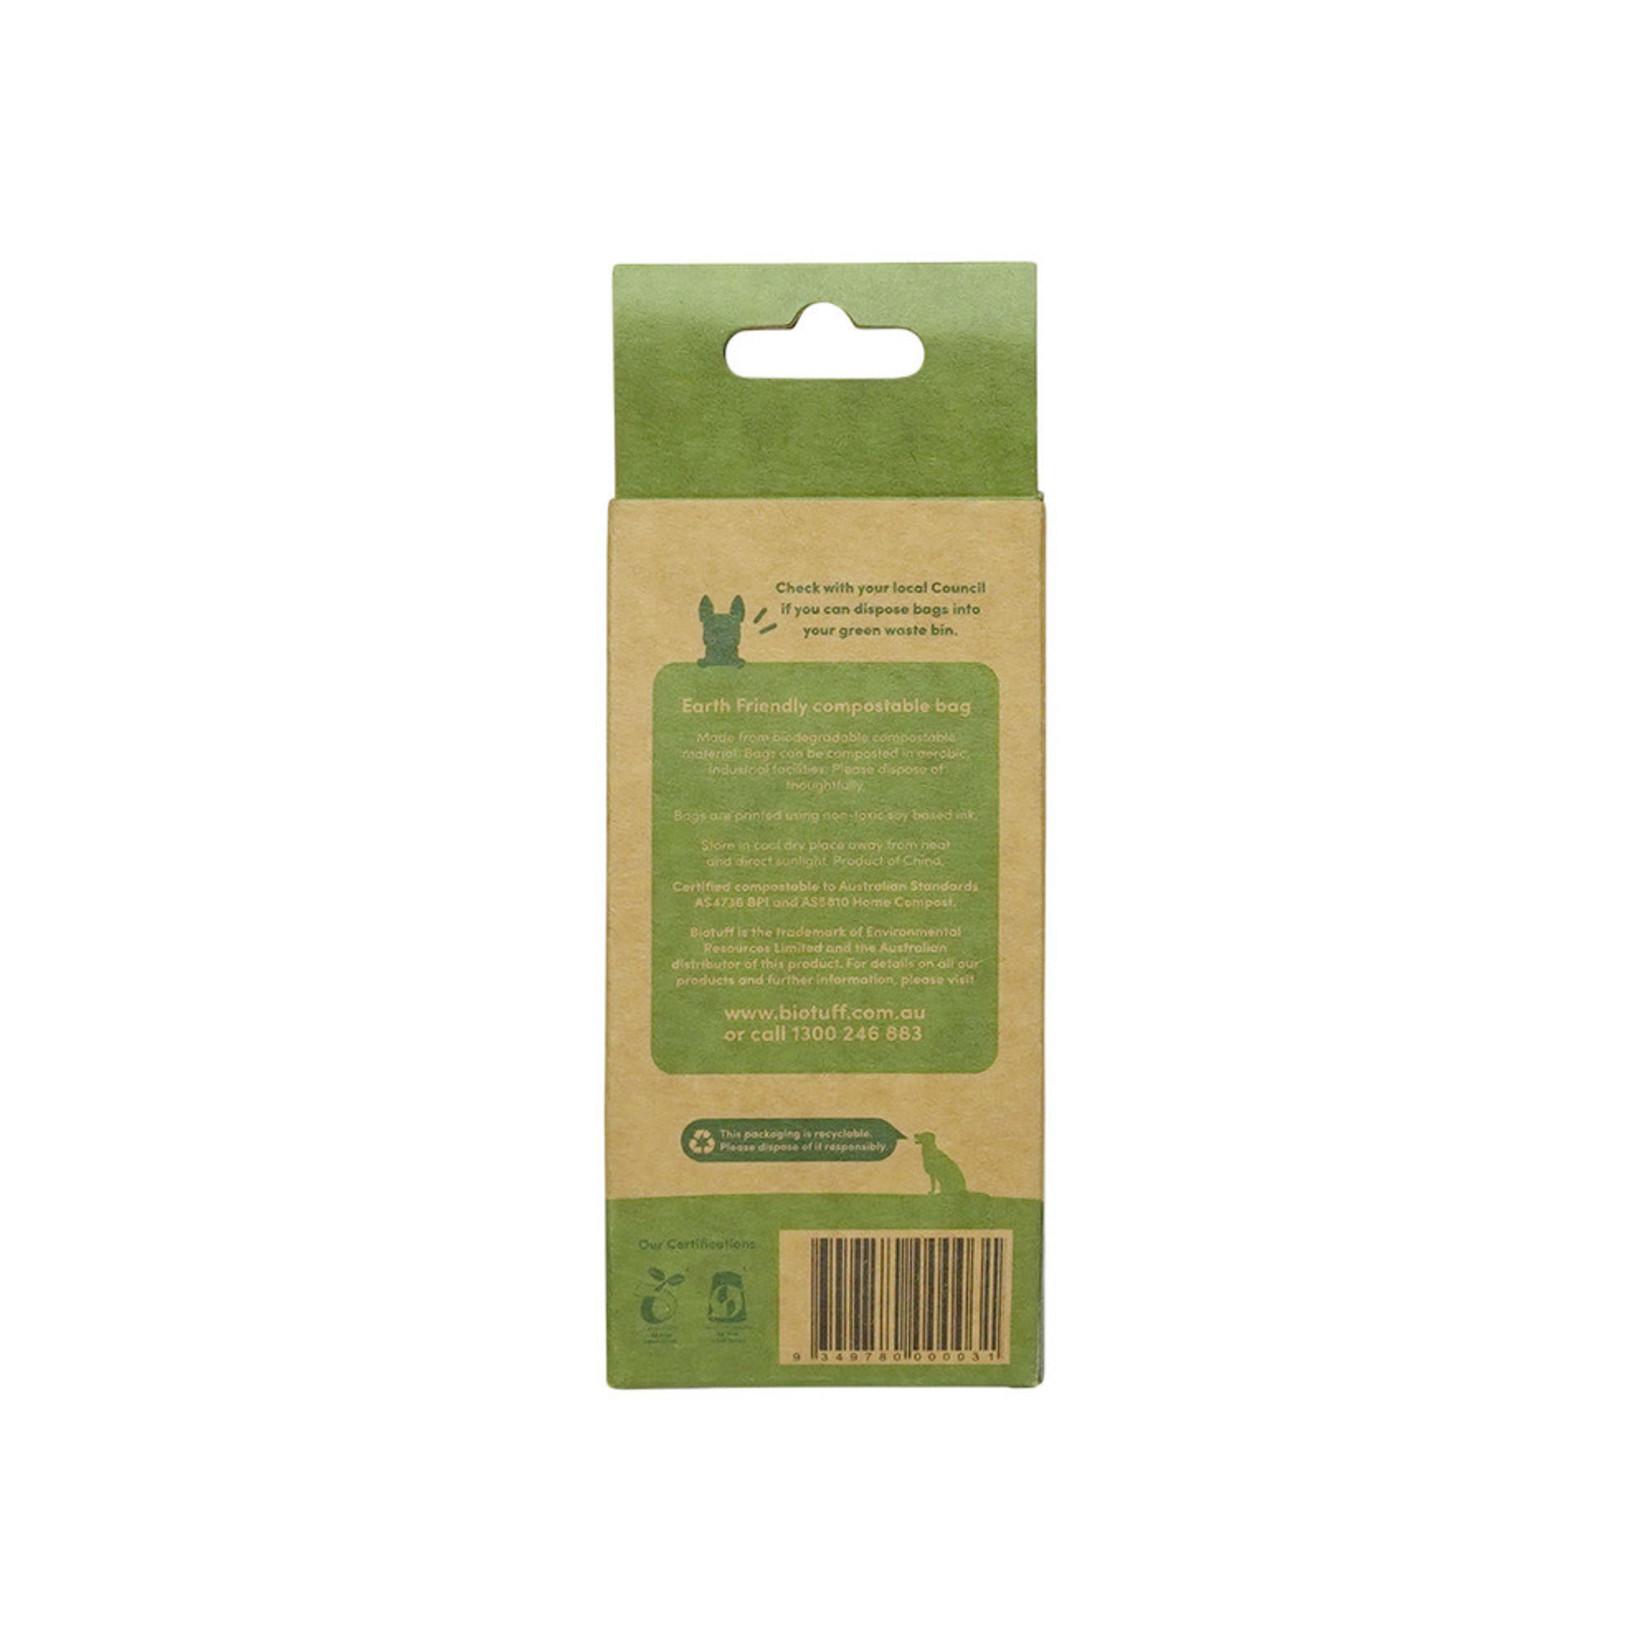 Biotuff Biotuff Dog Waste Bags Refill (4x15)